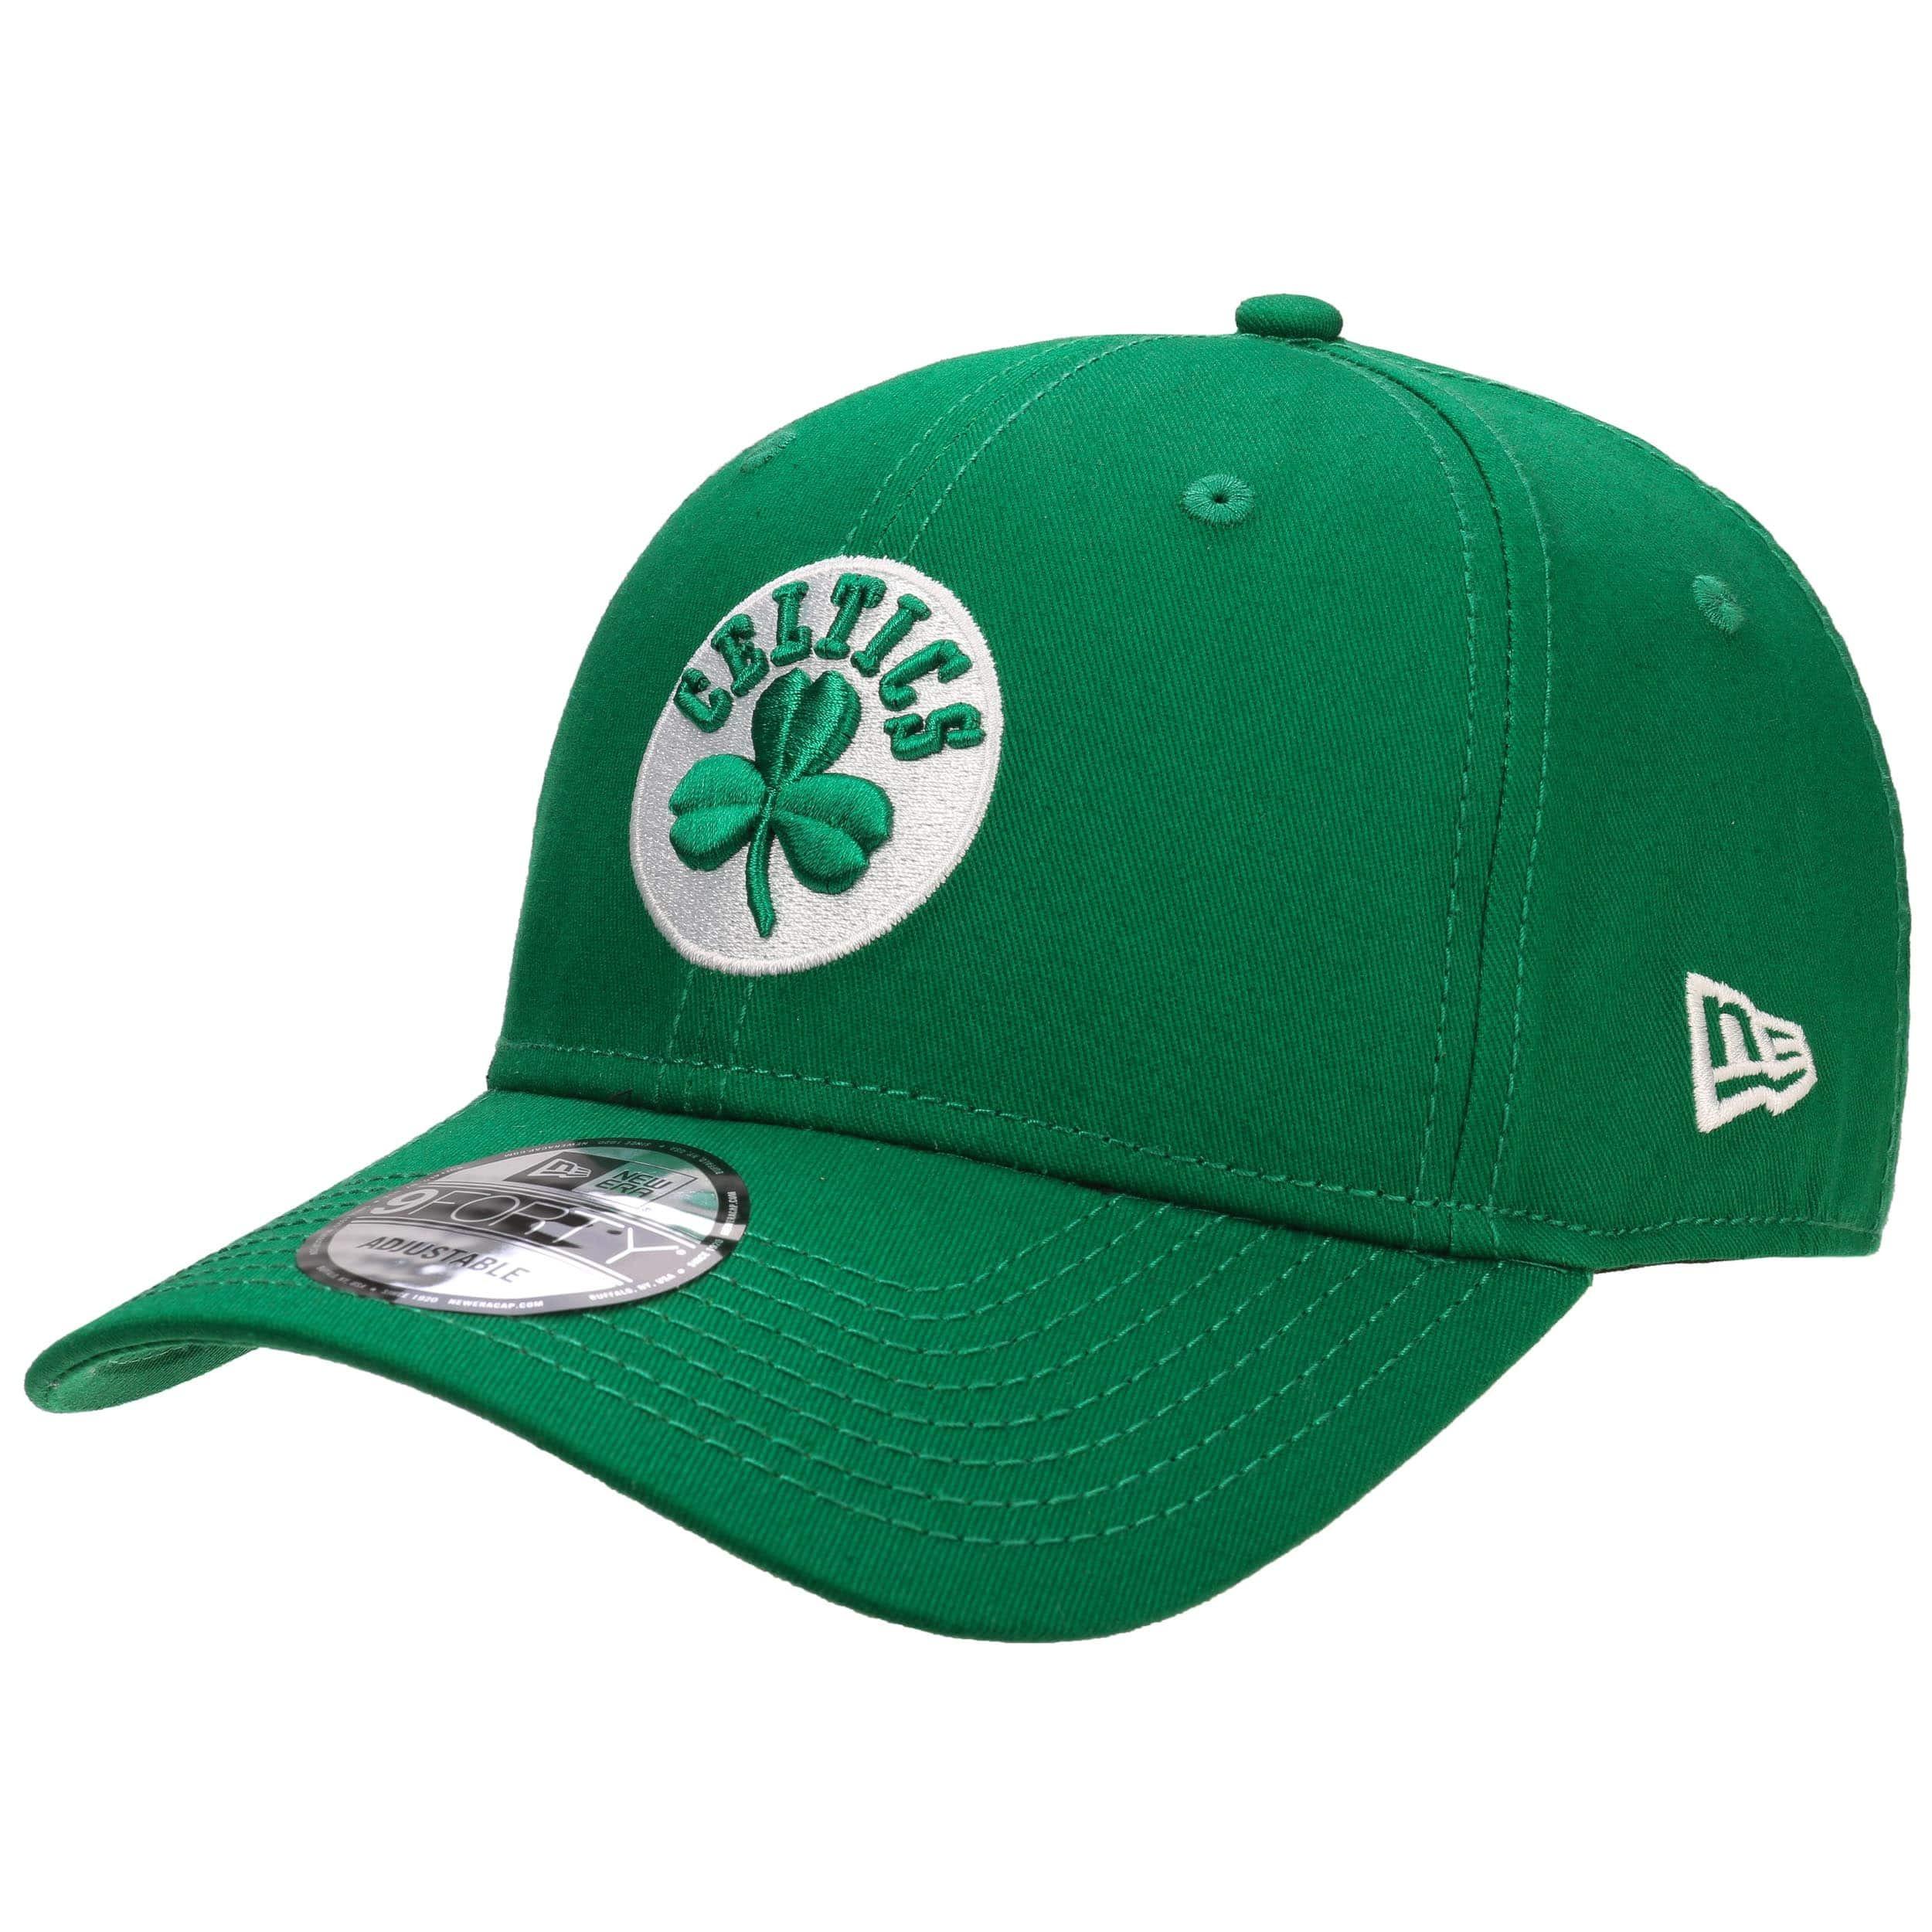 9forty boston celtics cap by new era eur 22 95 hats caps beanies shop online. Black Bedroom Furniture Sets. Home Design Ideas